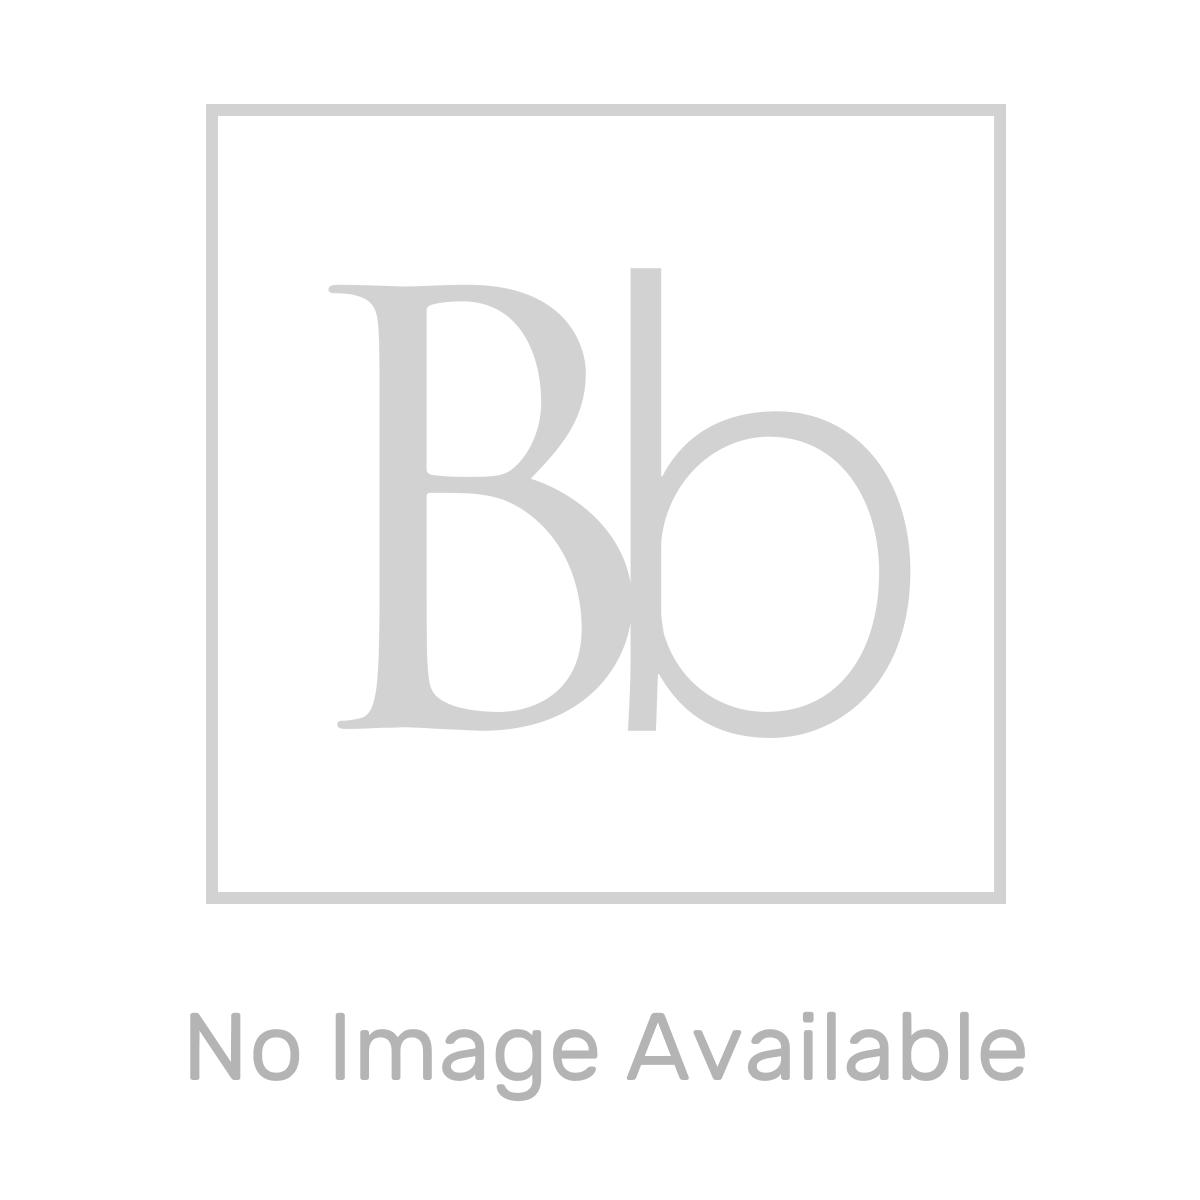 RAK Jessica Inset Countertop 1 Tap Hole Basin 530mm Measurements